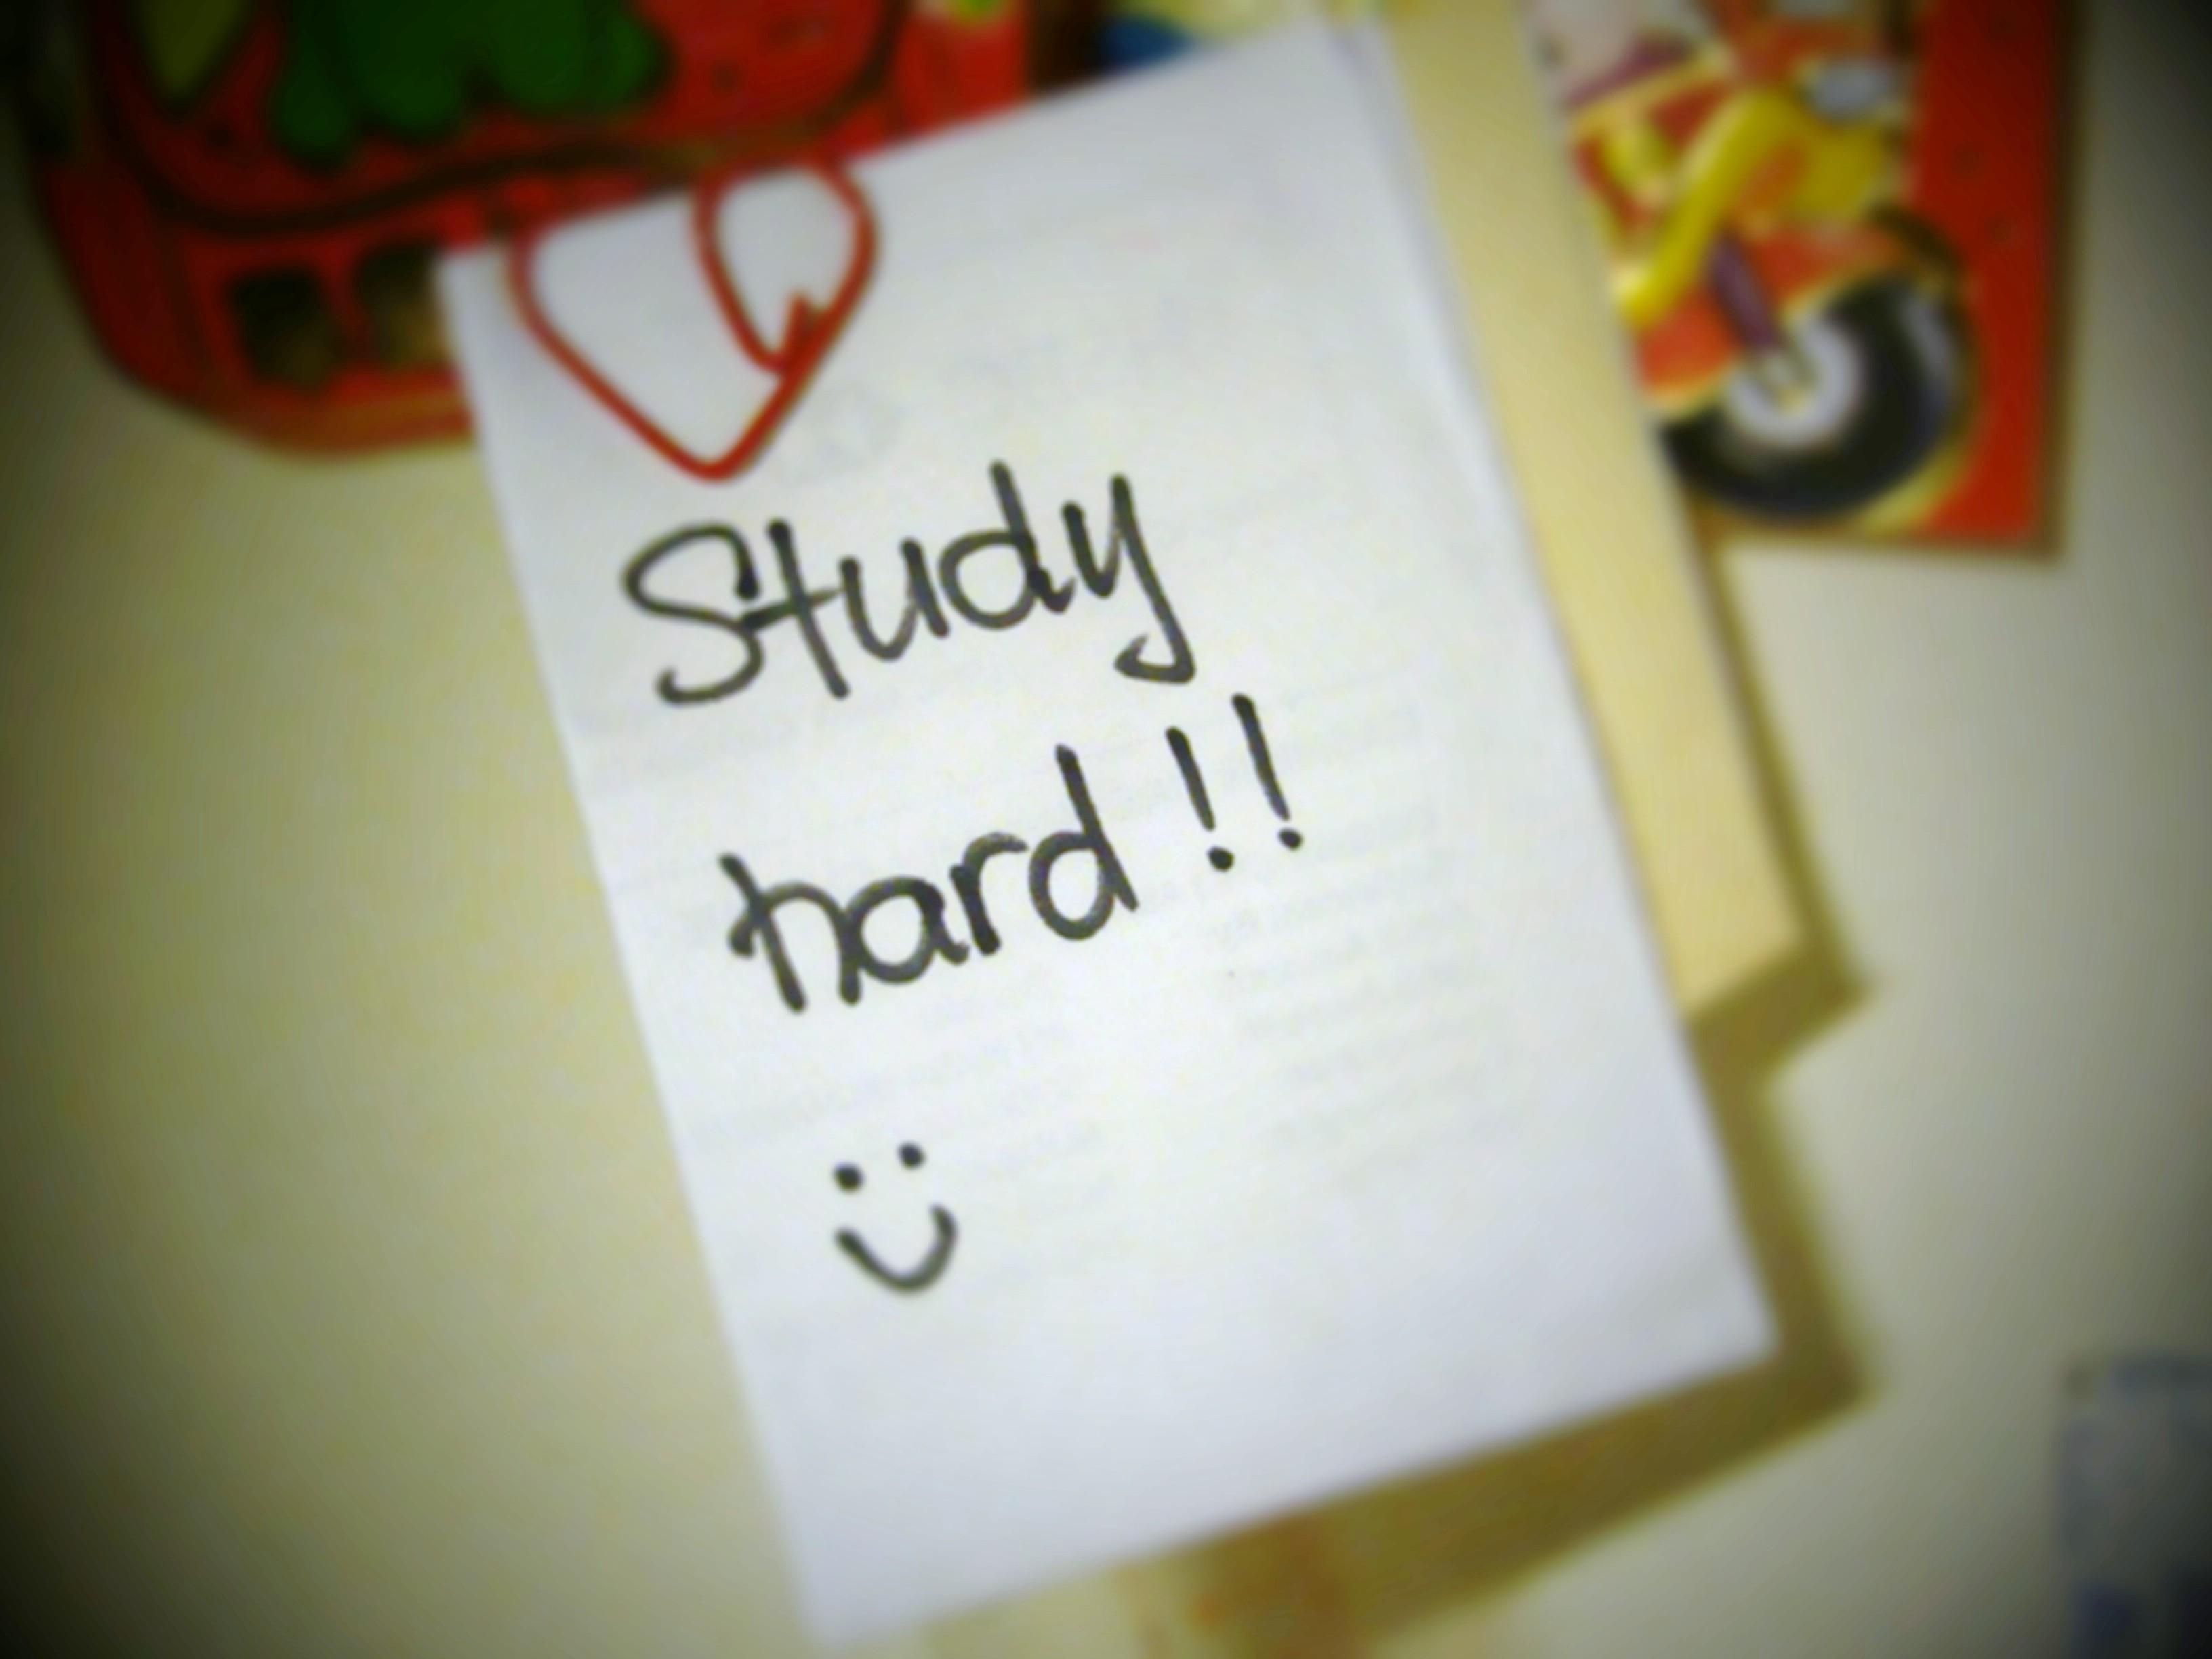 study-hard-3324.jpg (1024×1024)